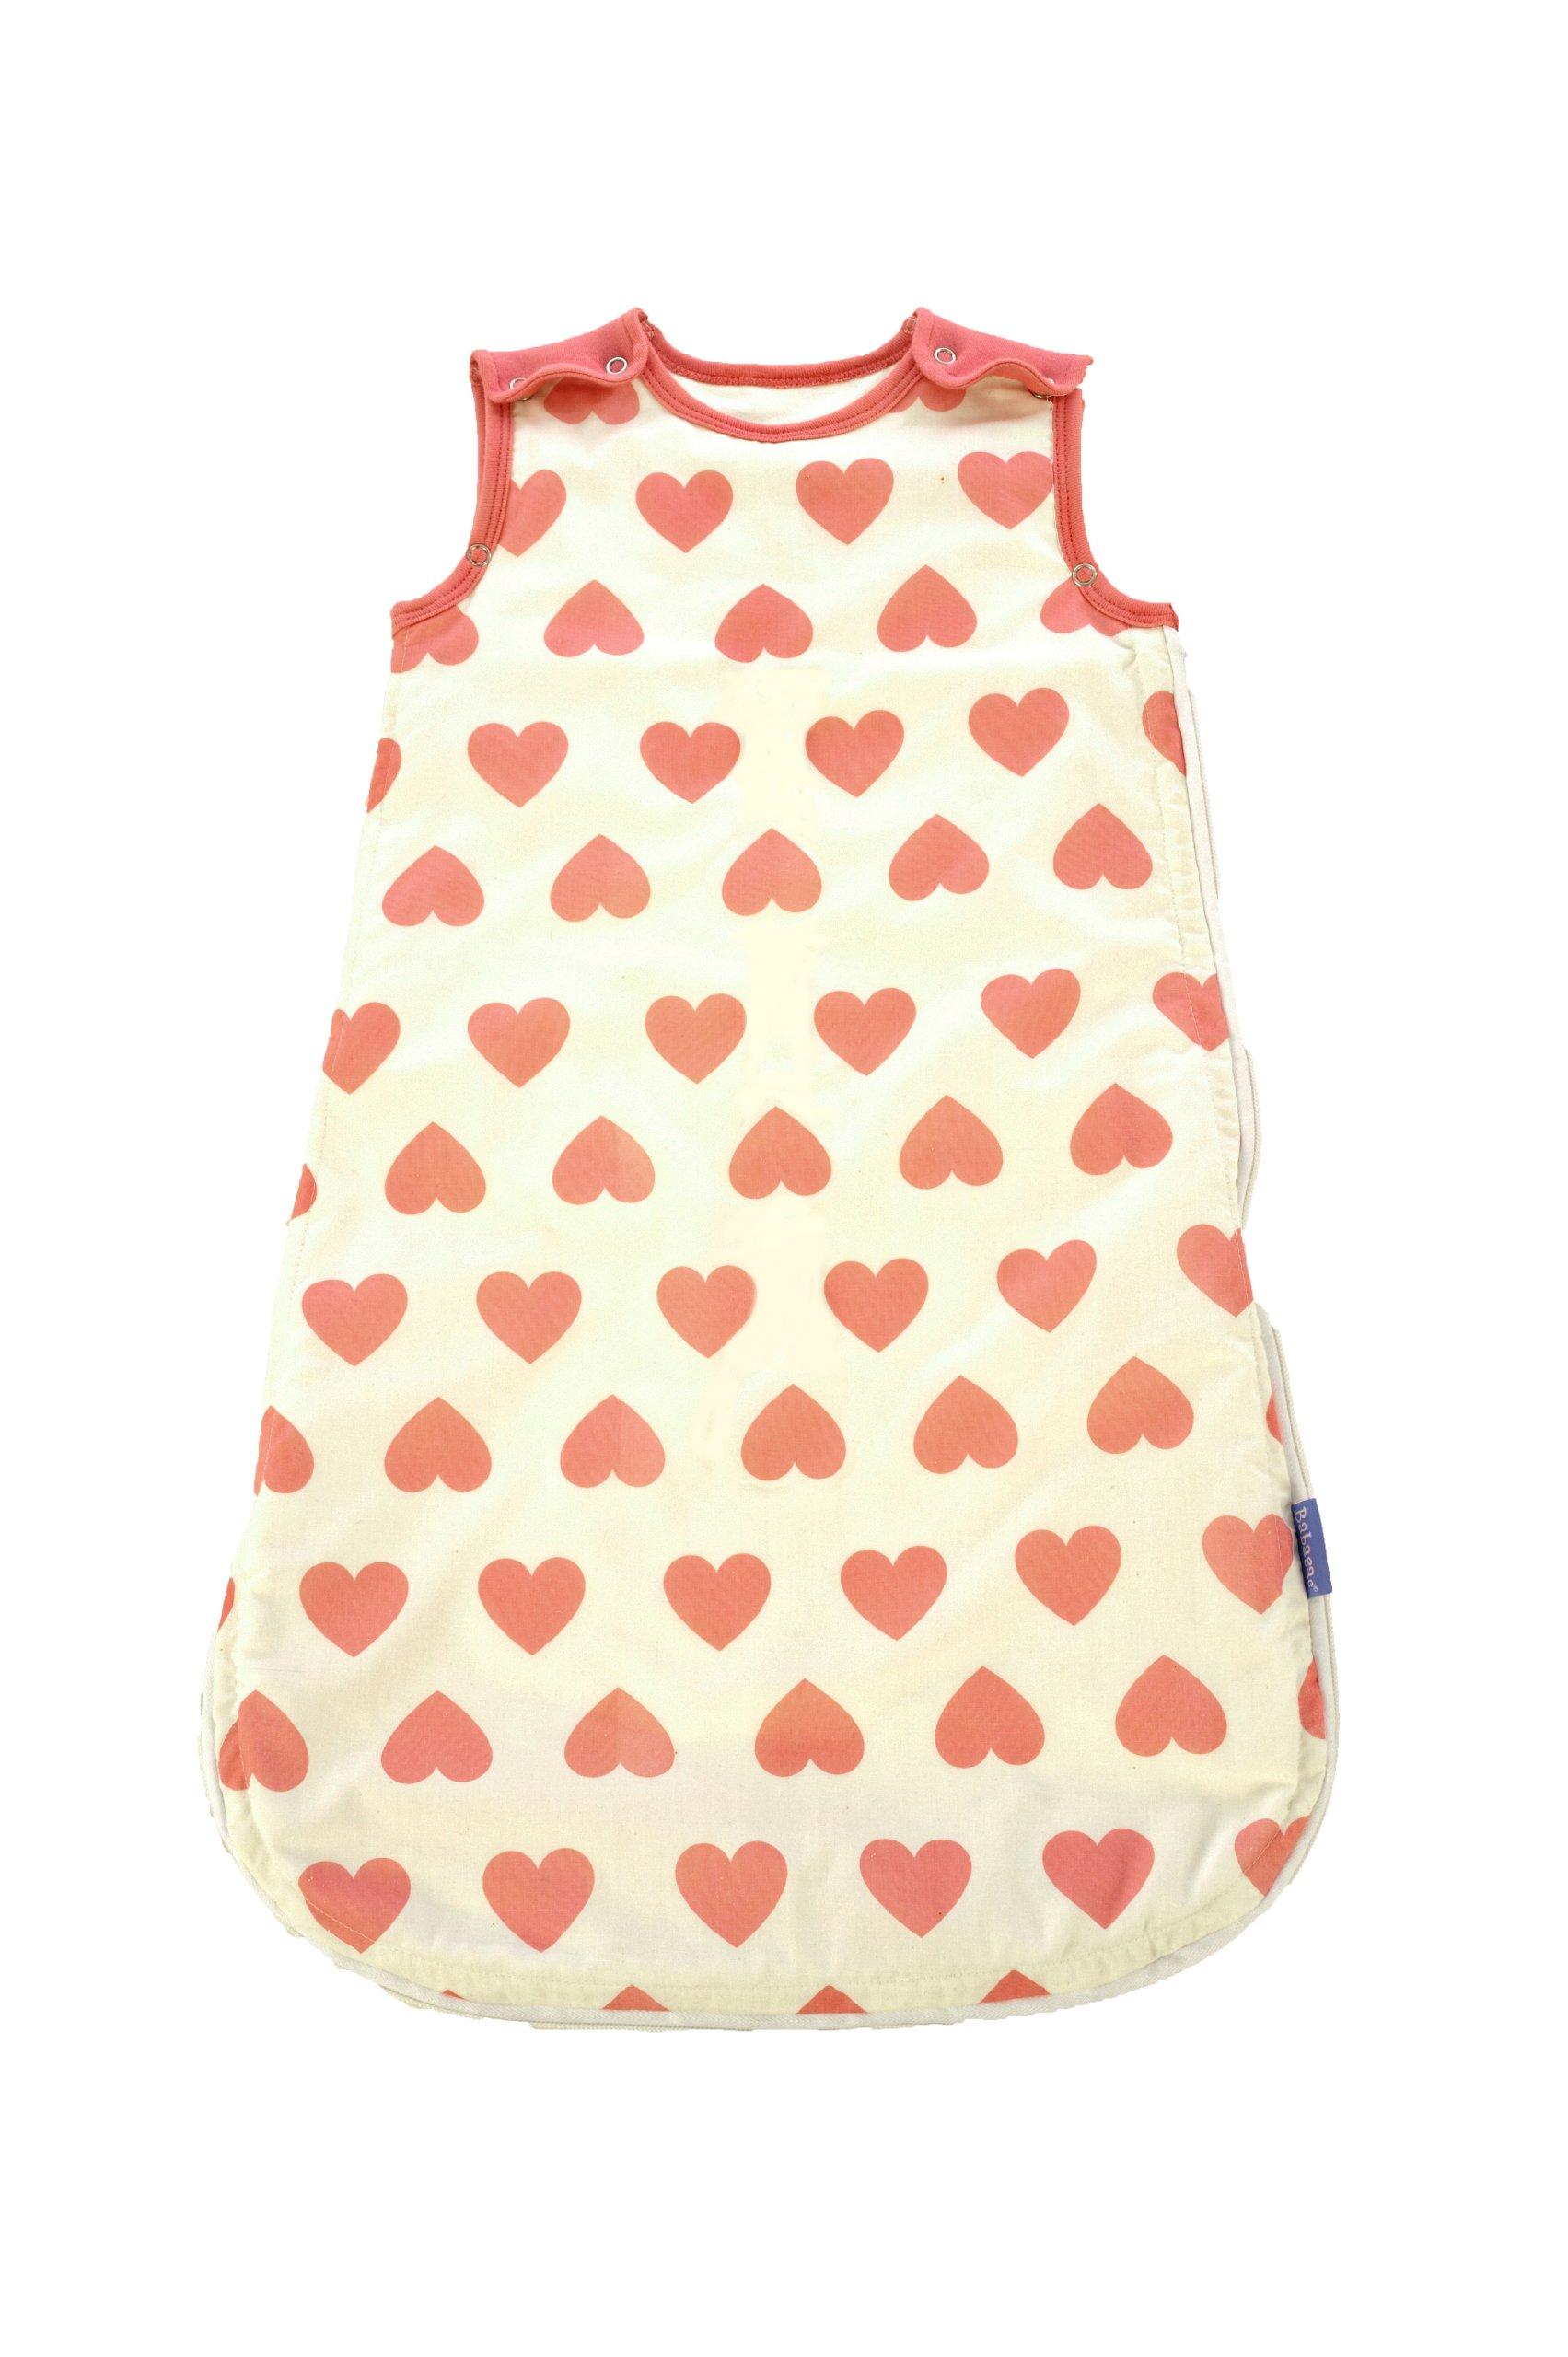 Babasac Multi Tog Baby Sleeping Bag Heart for 6 - 18 Months